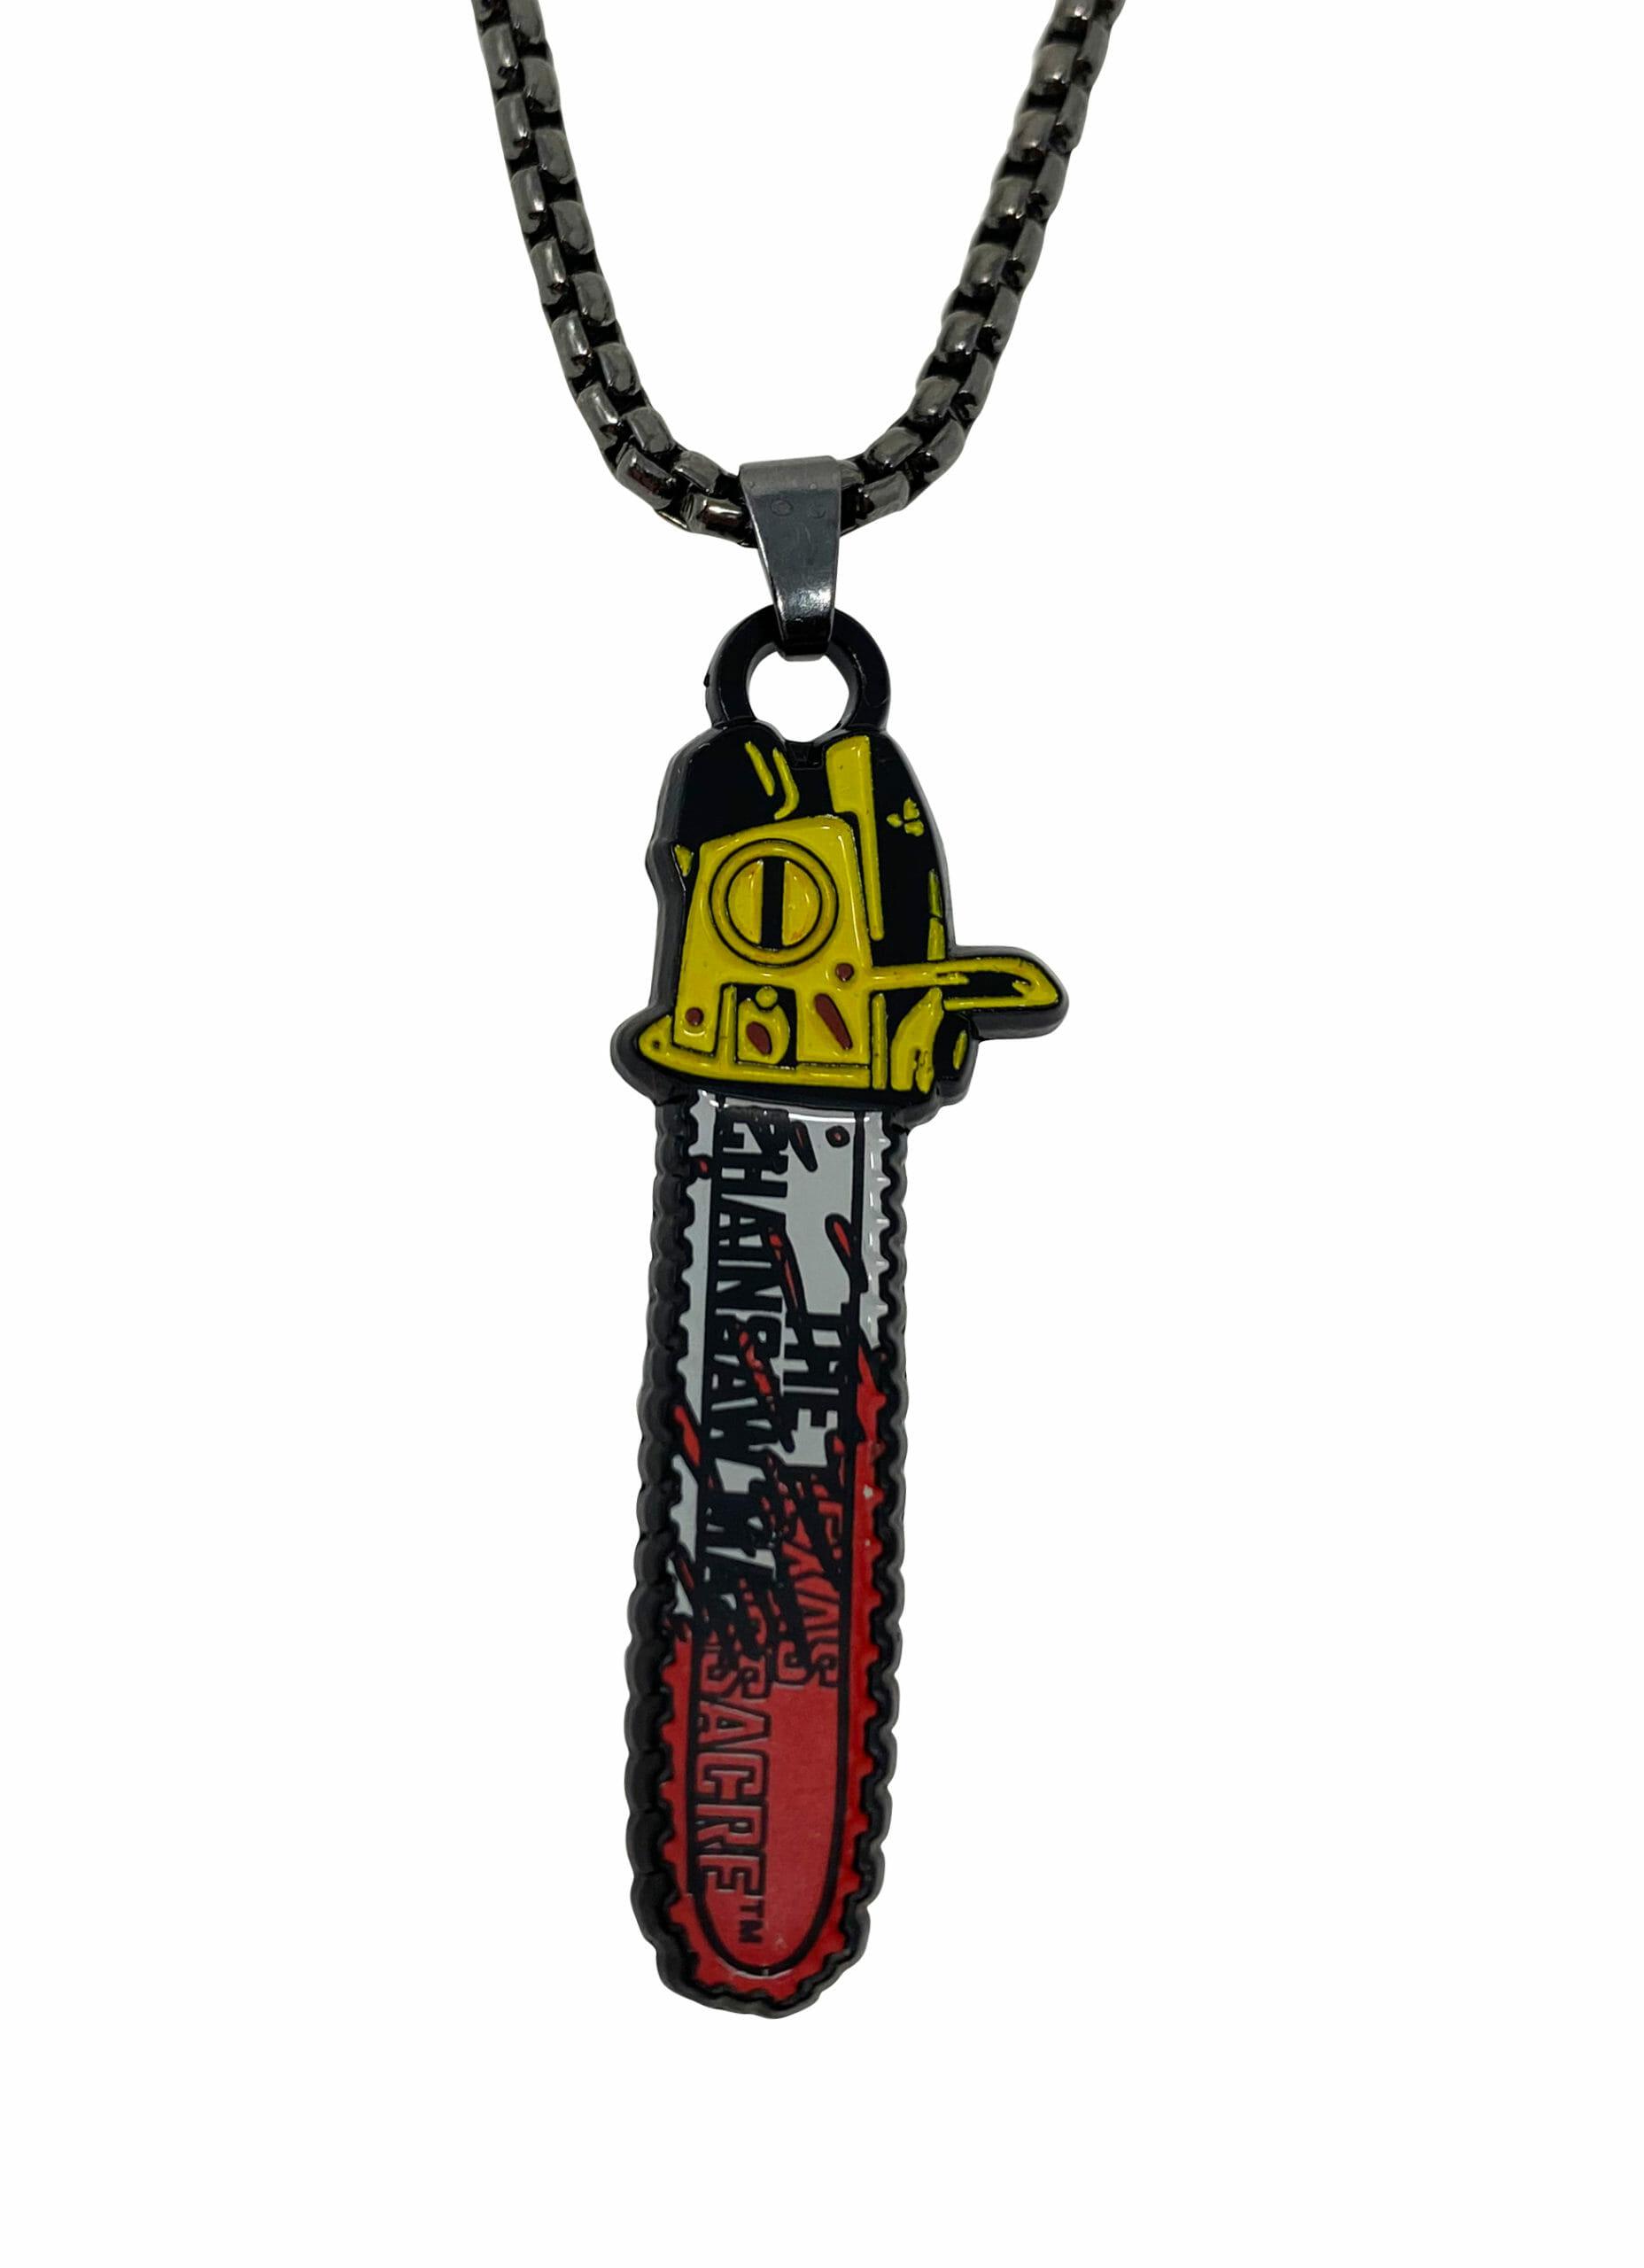 Texas Chainsaw Massacre Necklace